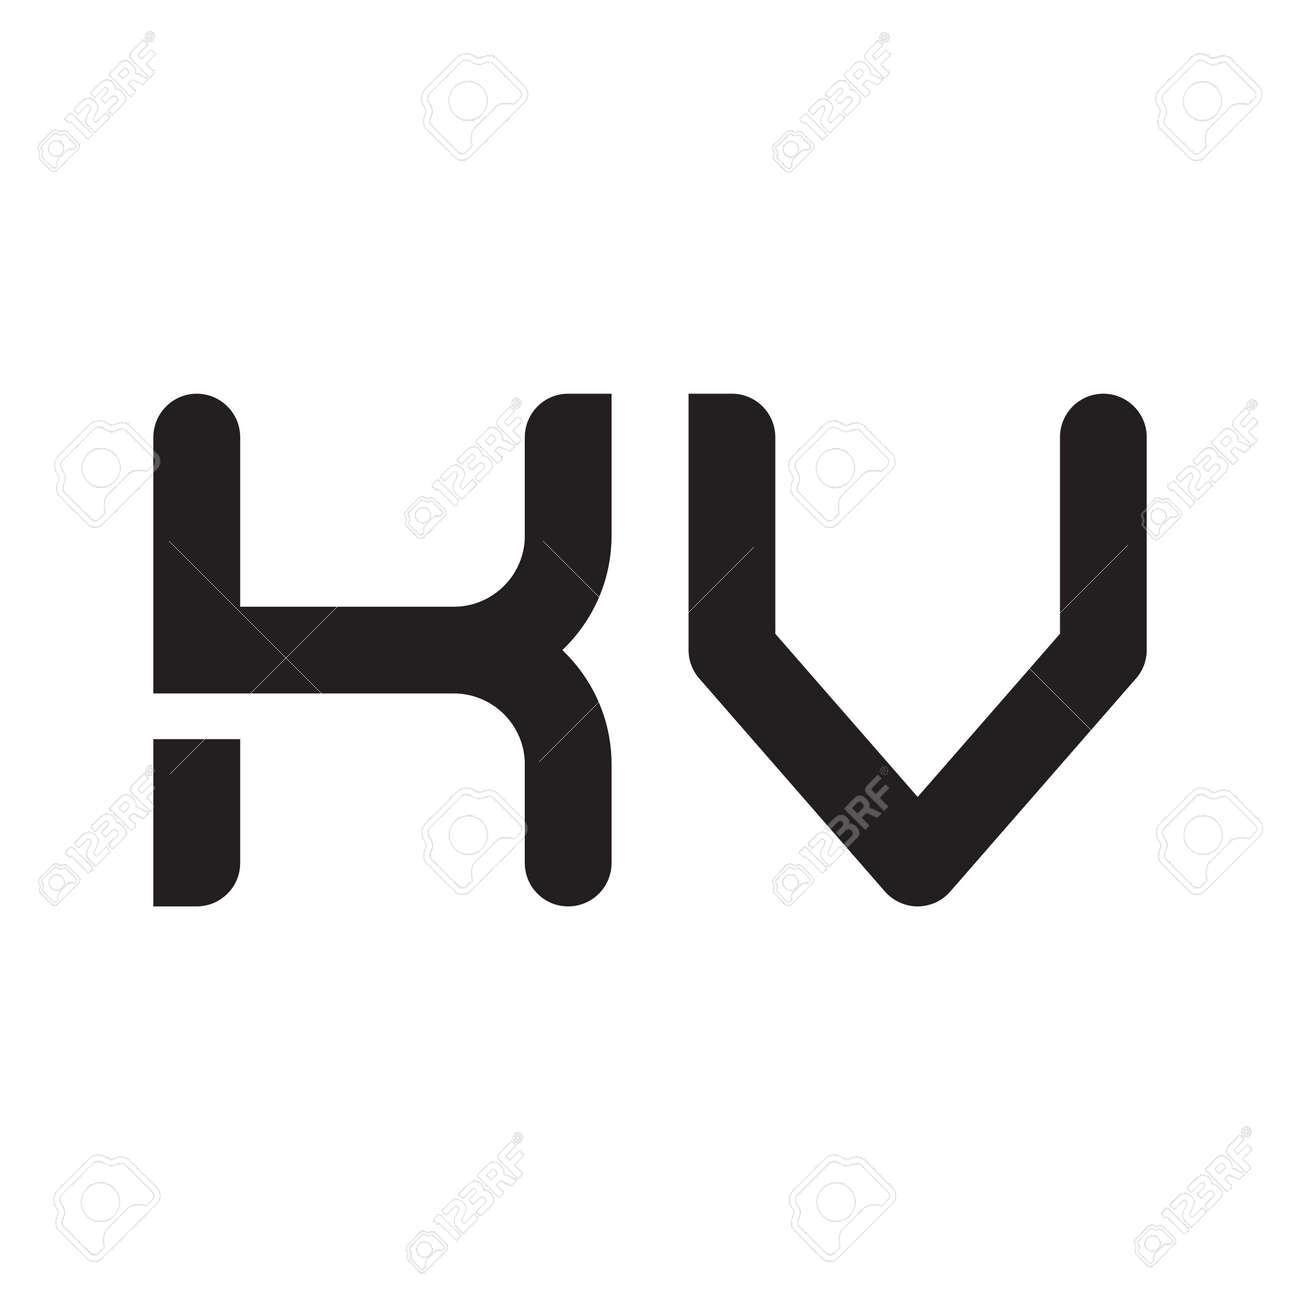 kv initial letter vector logo icon - 164323710